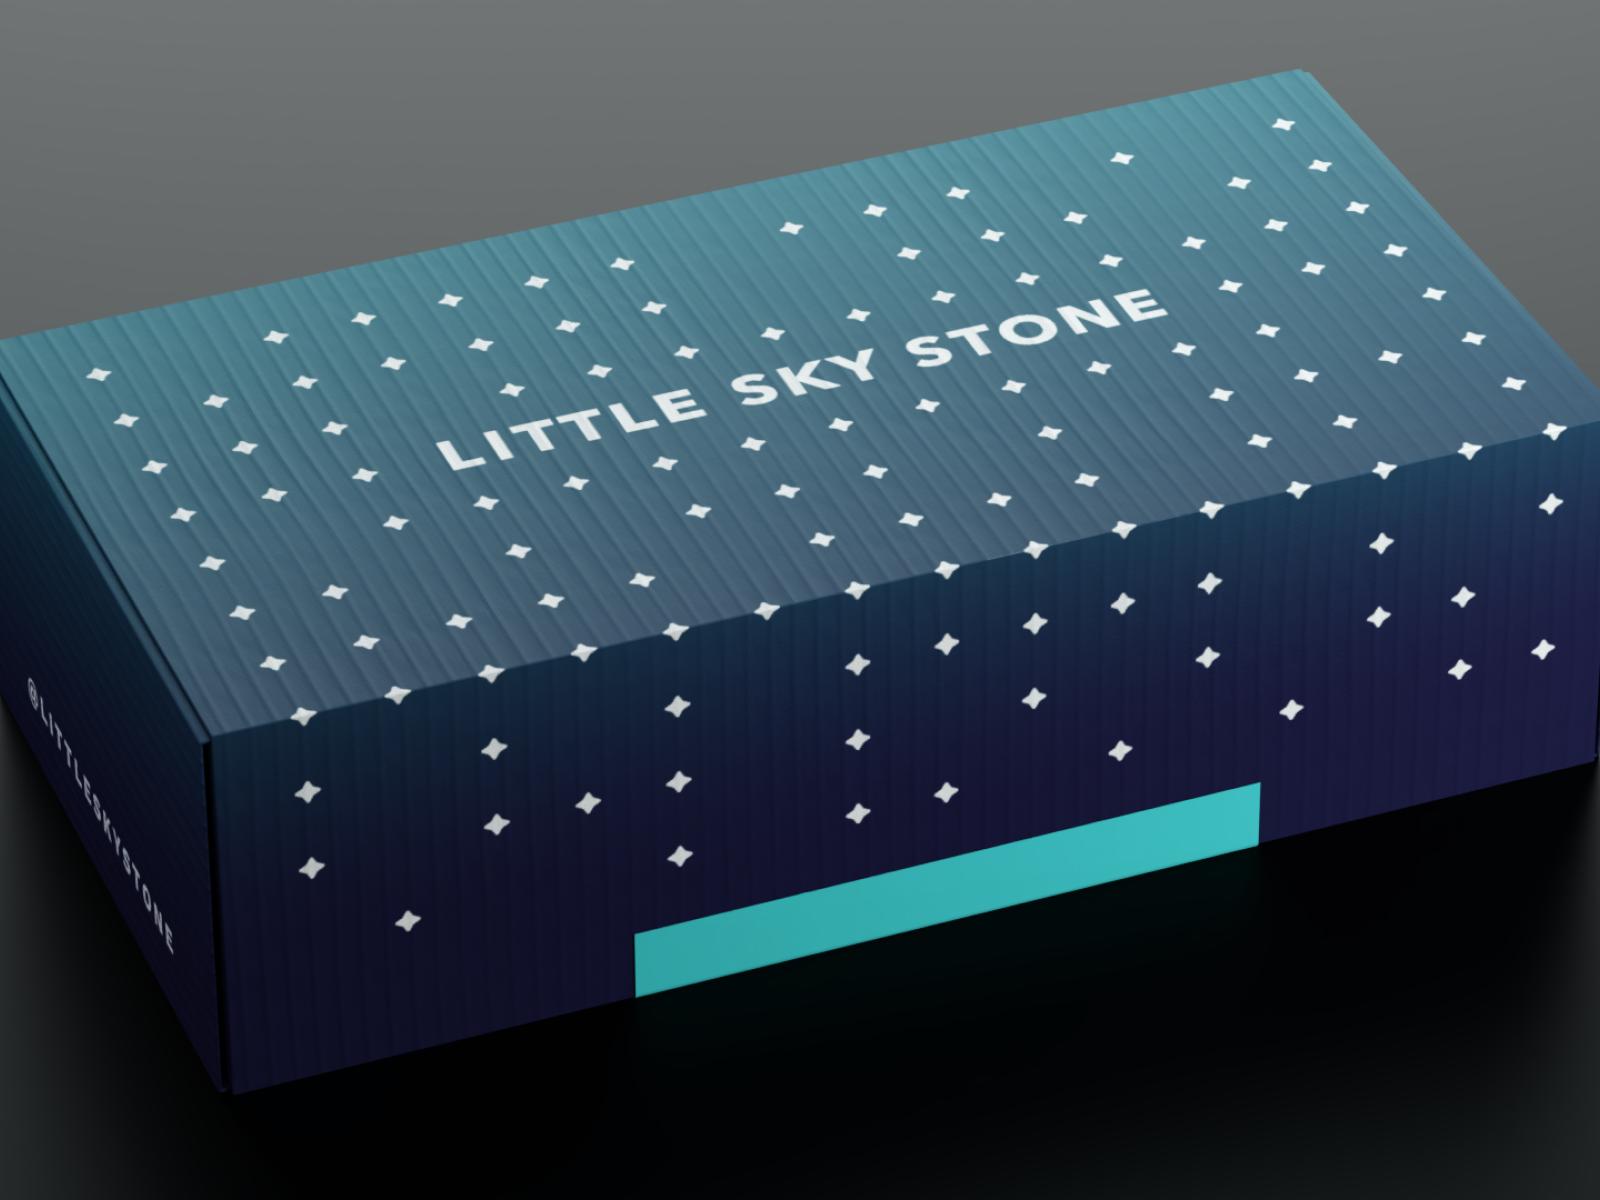 Little Sky Stone Package Design